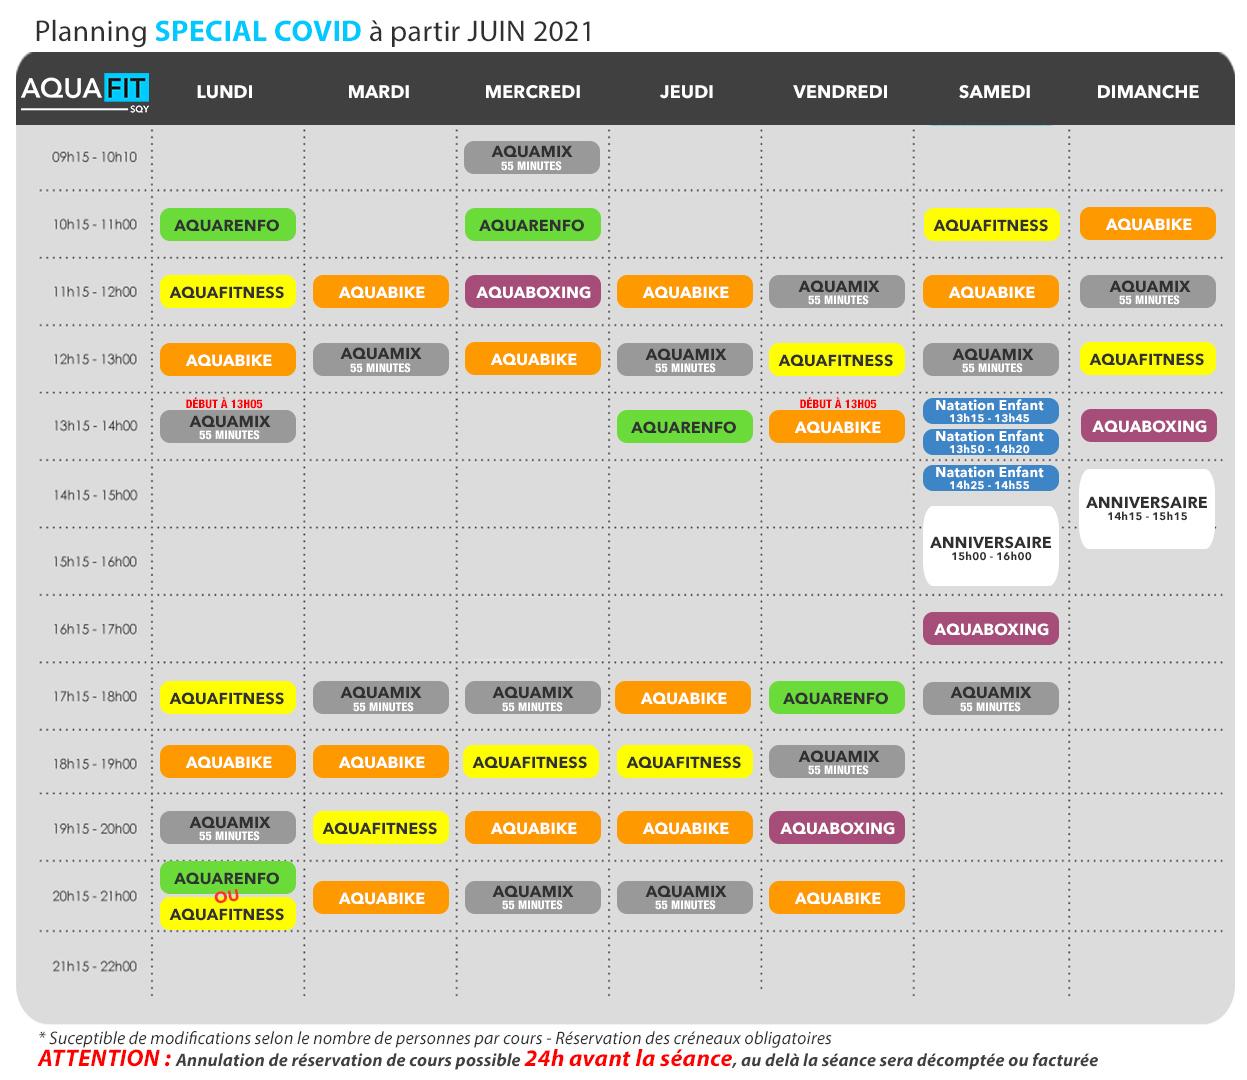 Planning COVID JUIN 2021